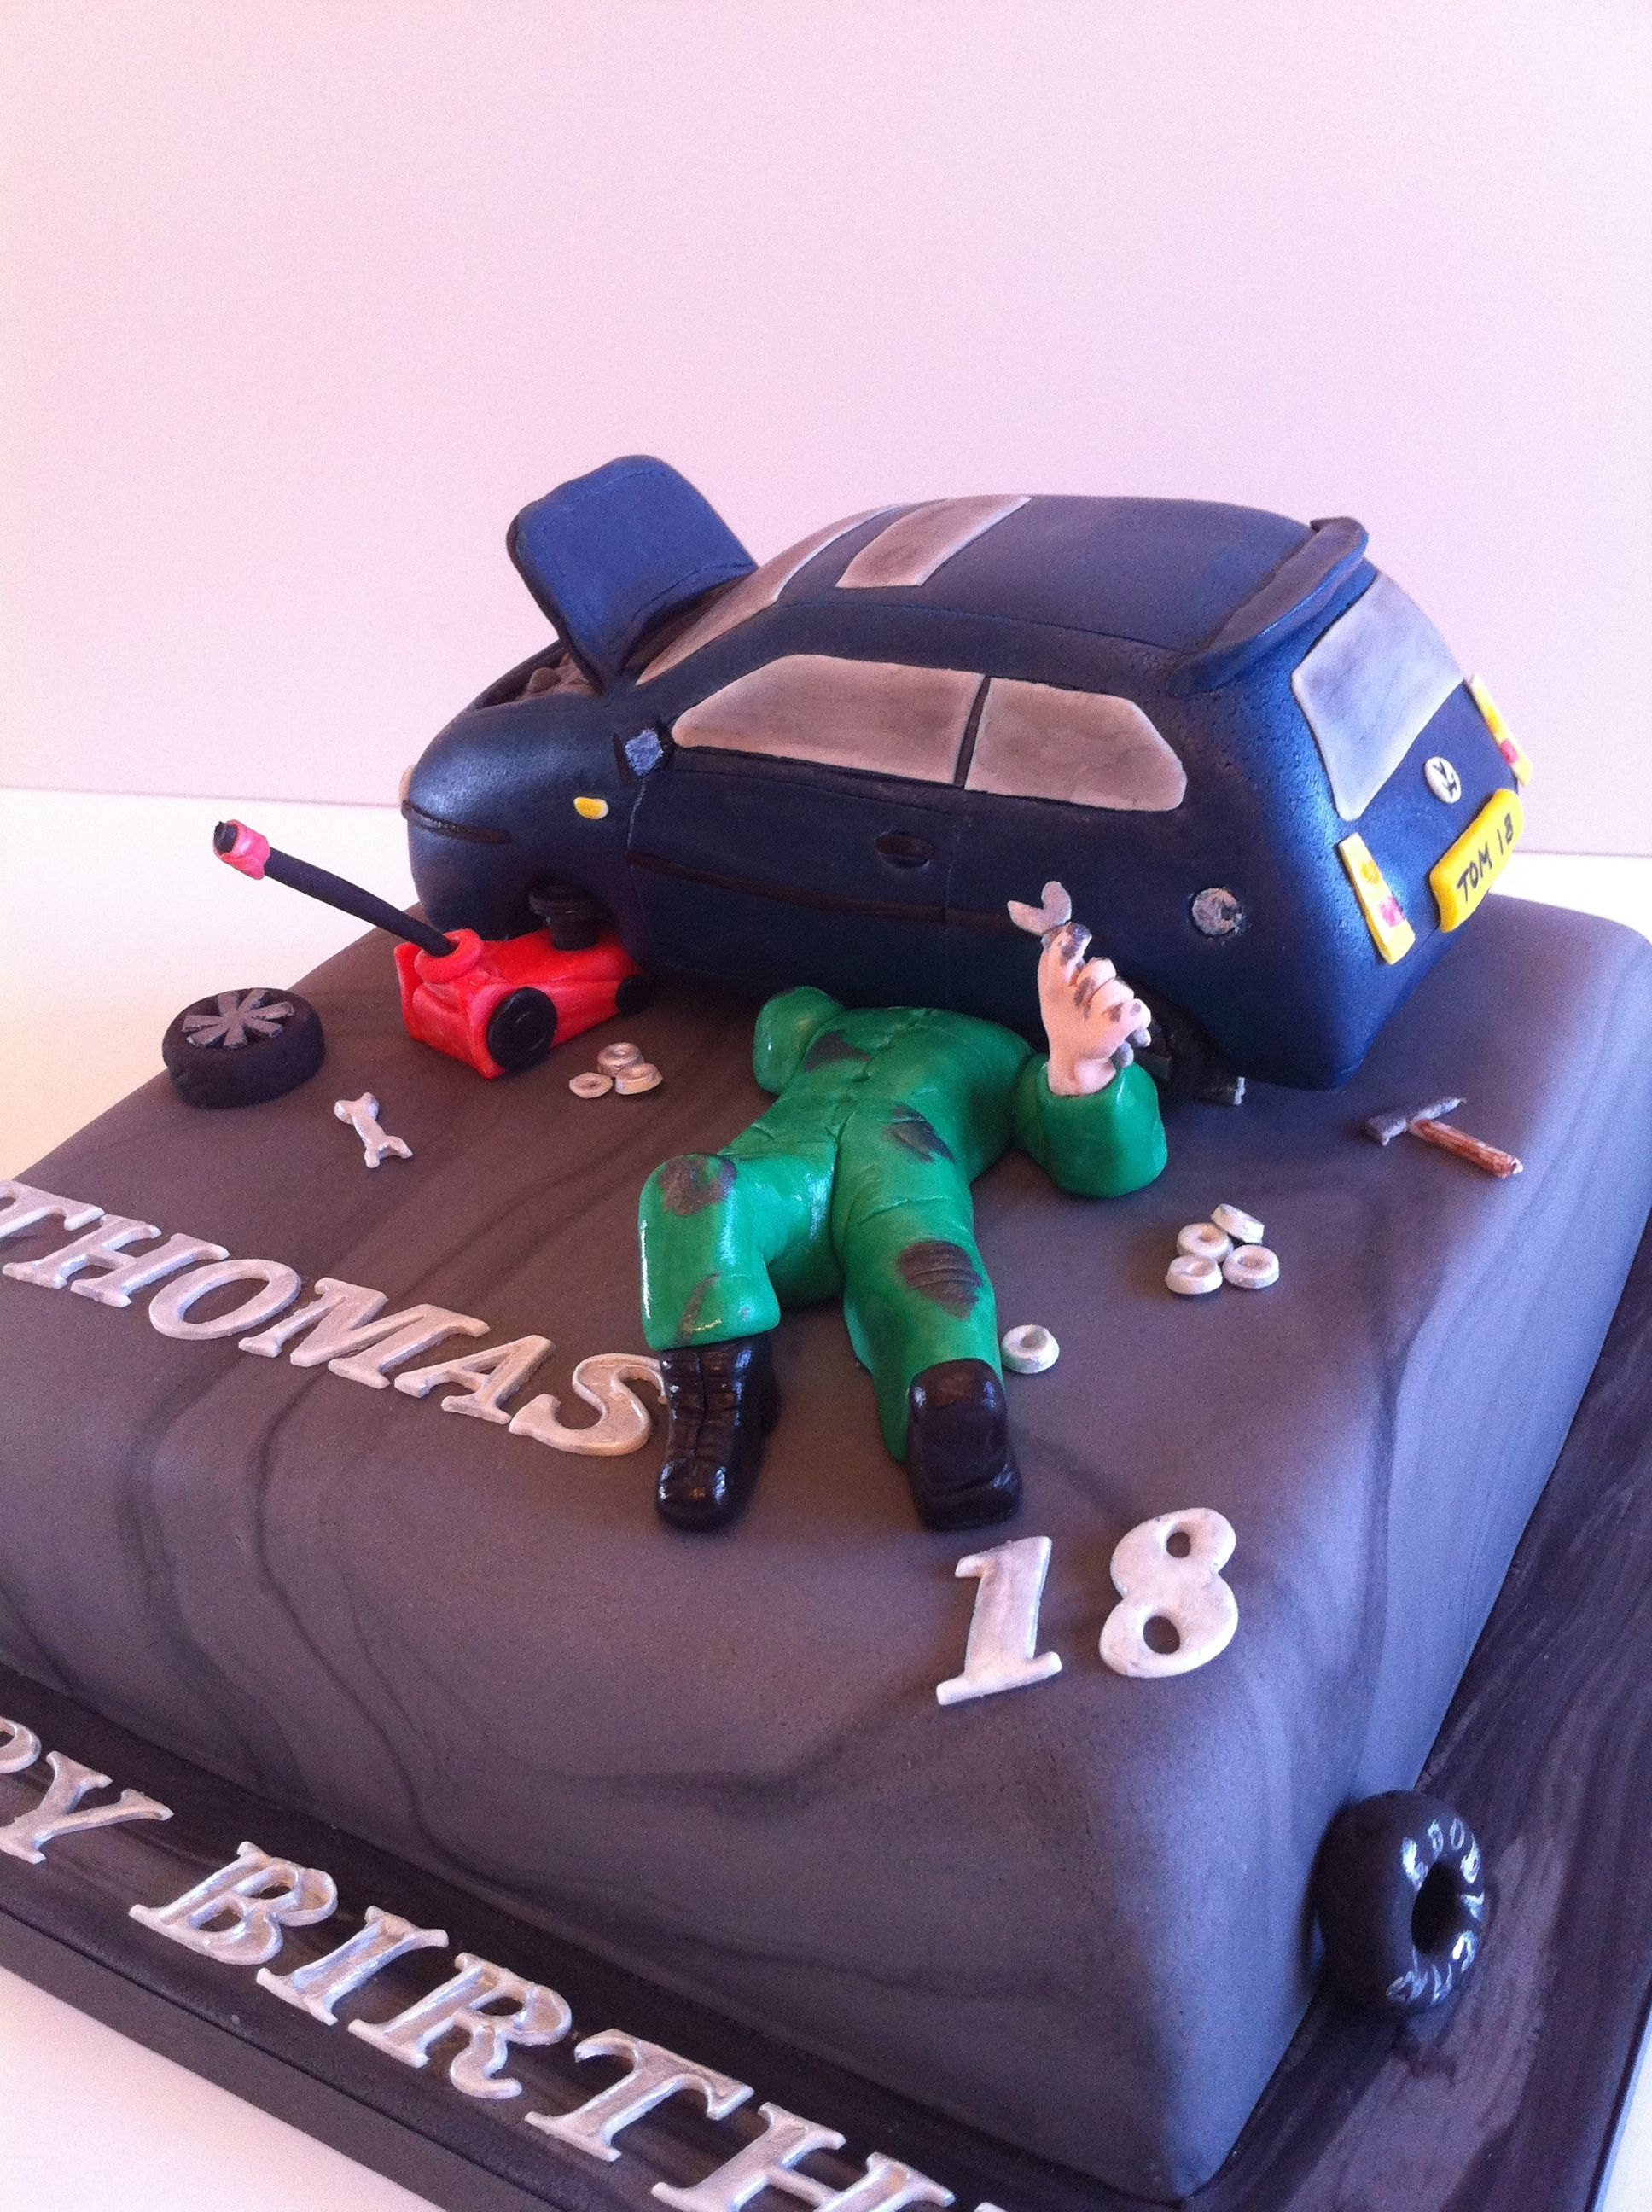 Car Mechanics St Birthday Cake By Femmebrulee Amazing Cakes - Car engine birthday cake